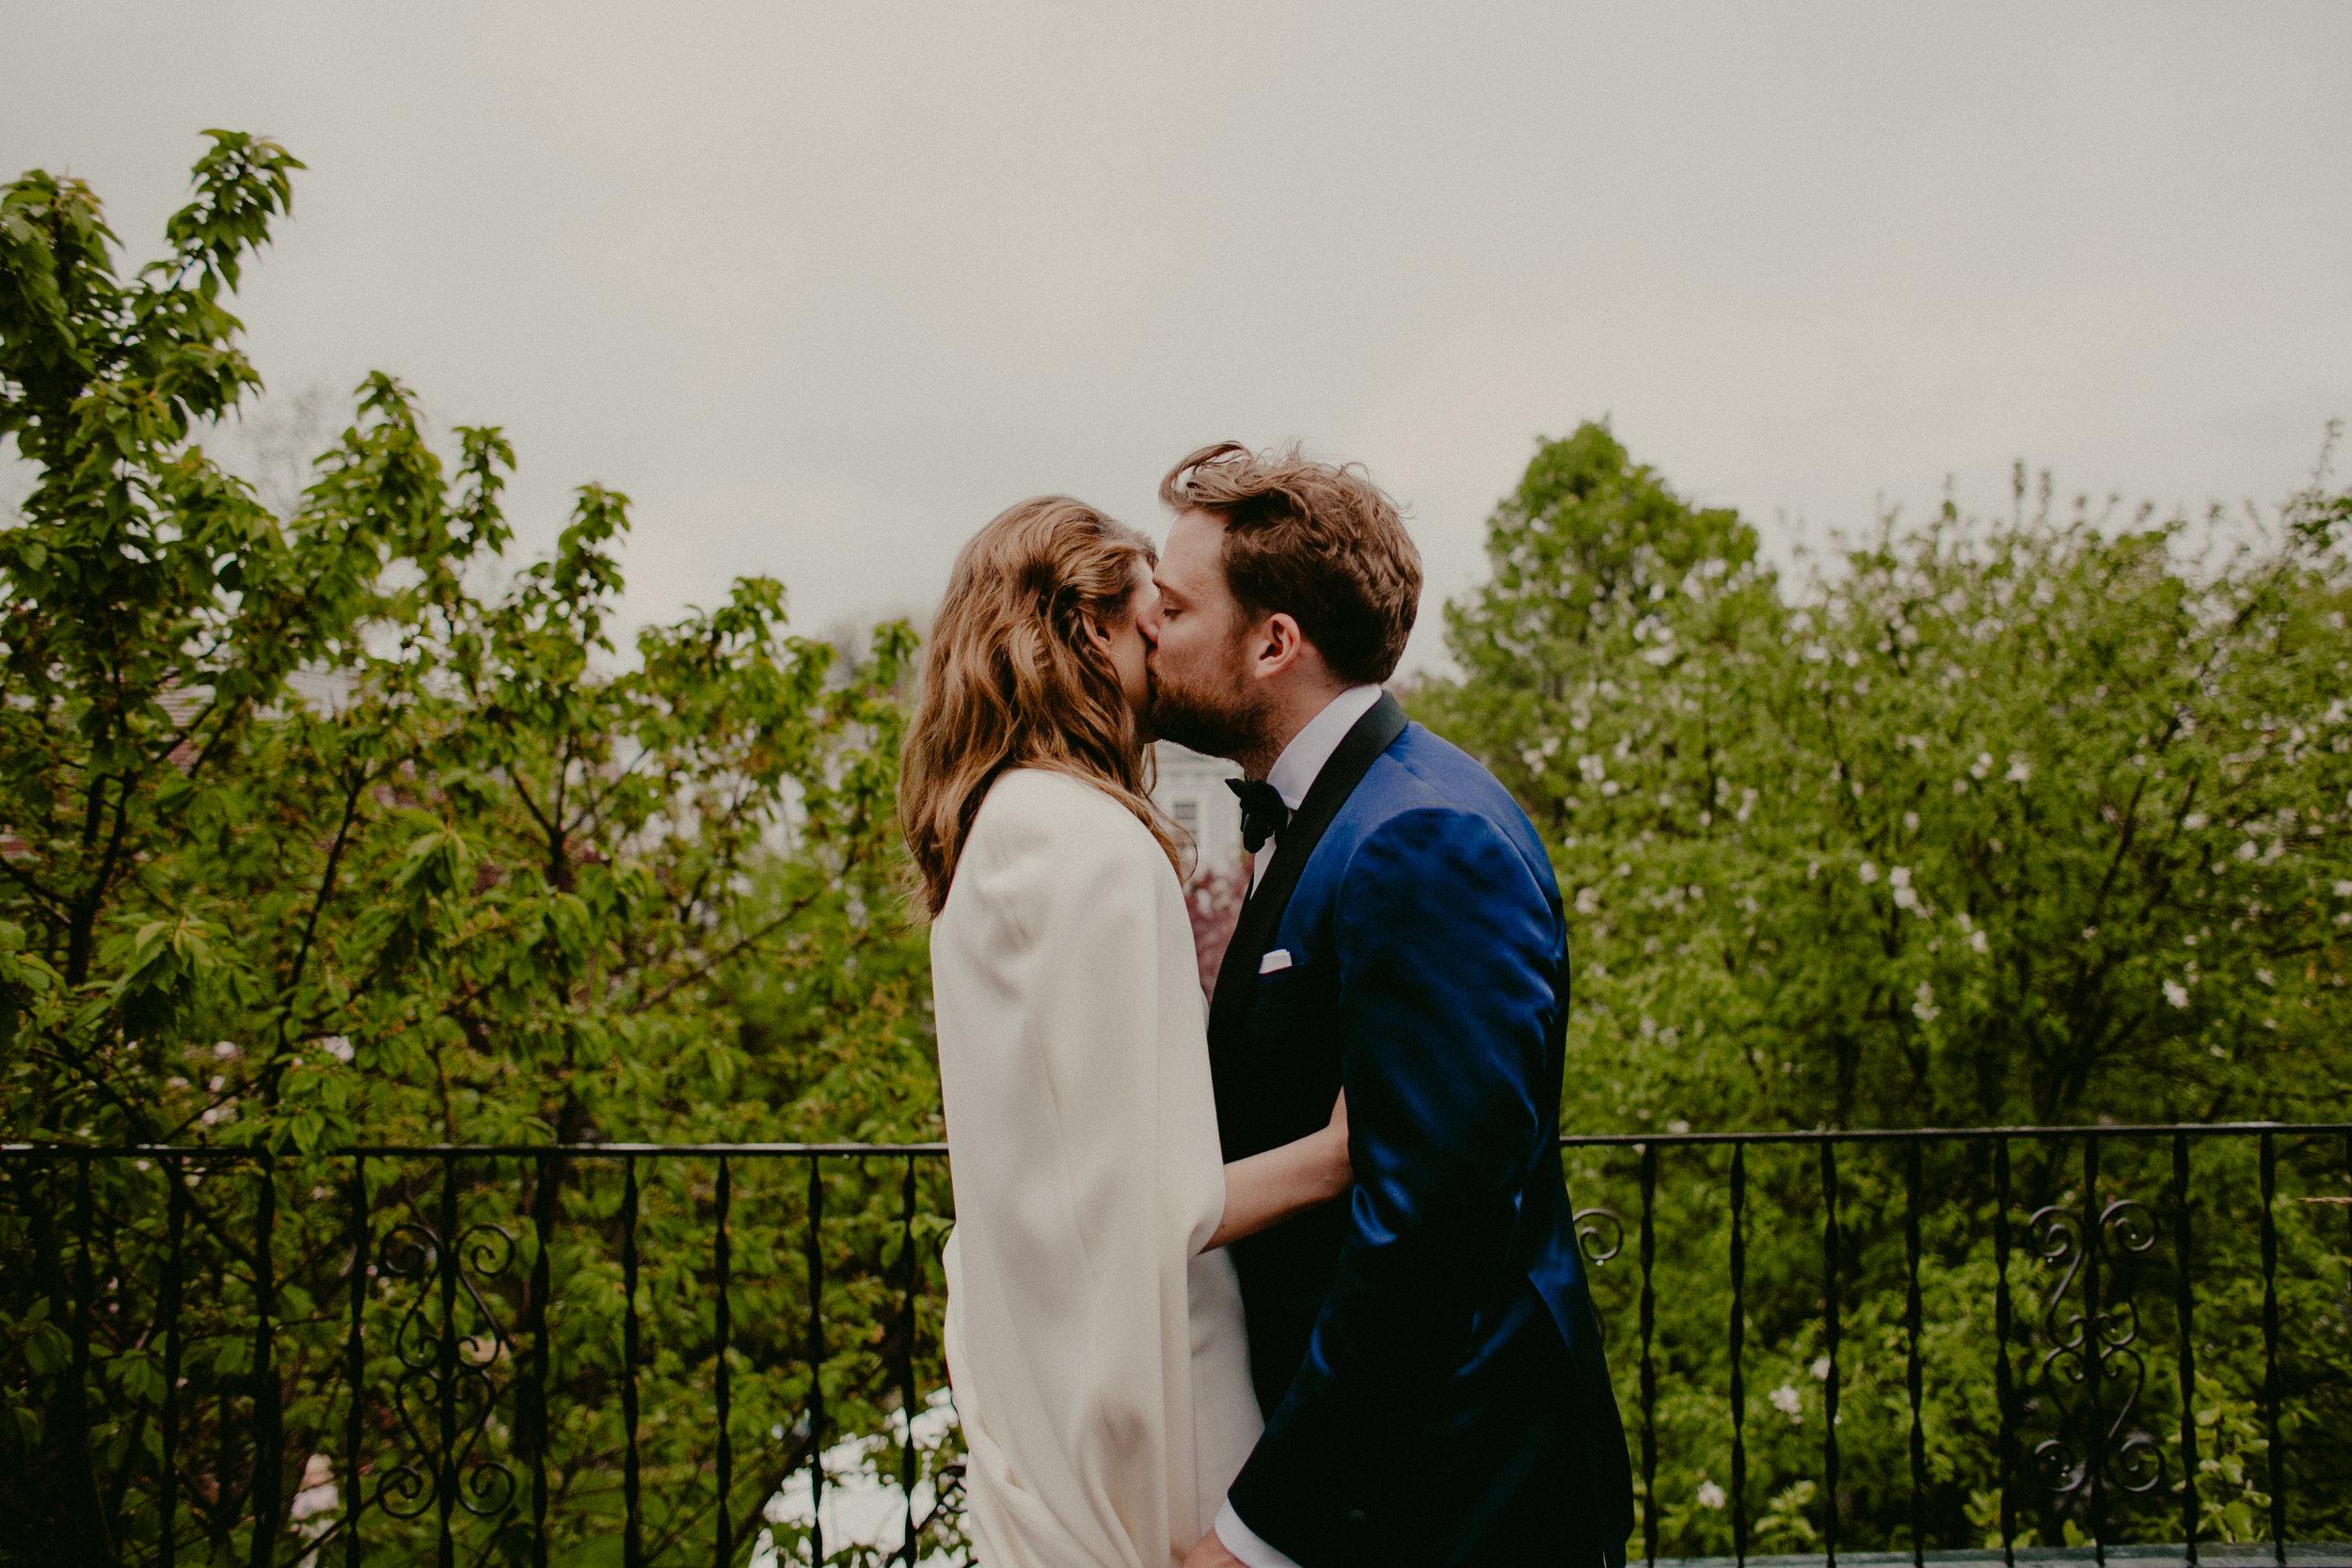 Tiger_House_The_Inn_at_Hudson-Wedding_Chellise_Michael_Photography-324.jpg